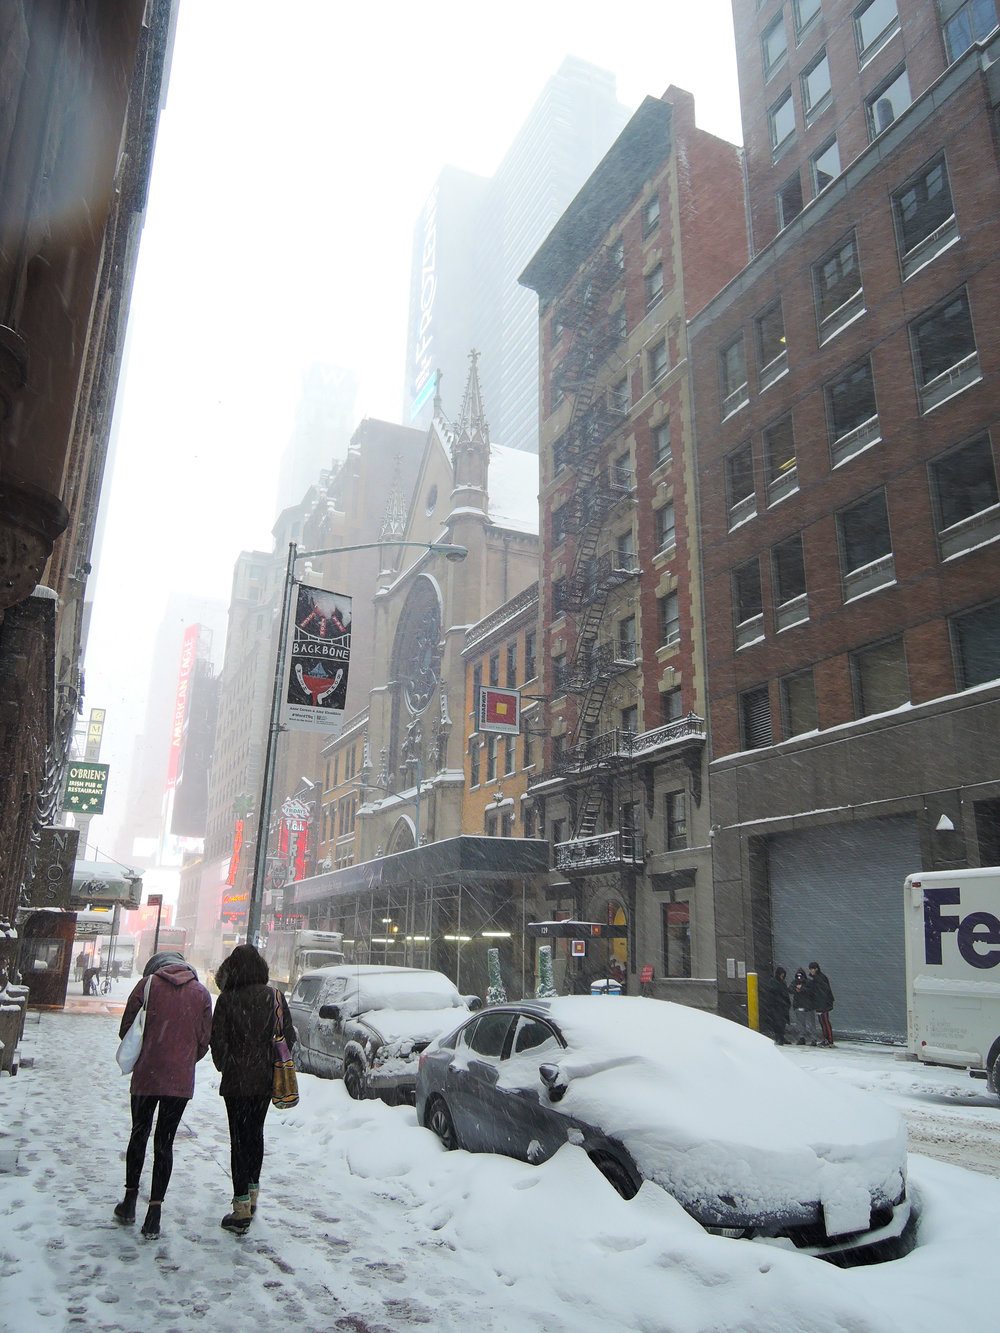 West 46th Street, January 4, 2018 Photo by Sr. Monica Clare, C.S.J.B.